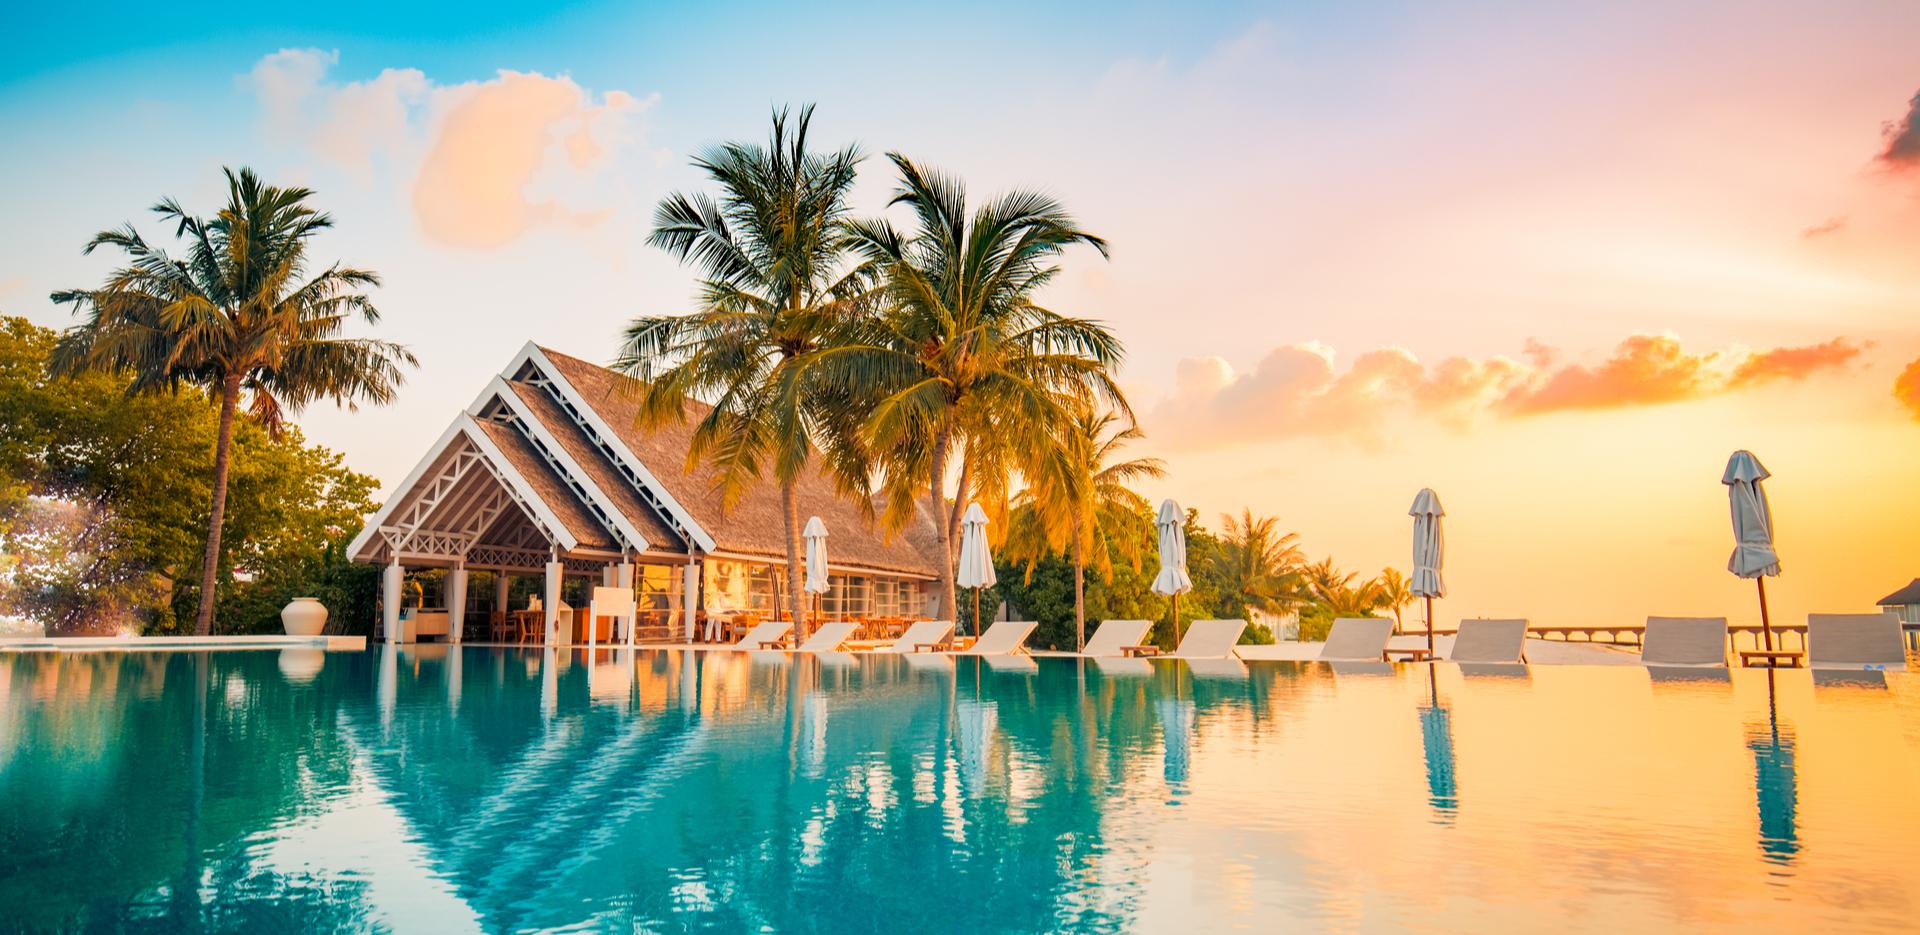 Boulevard 9 – Luxury Resort and Spa Resort